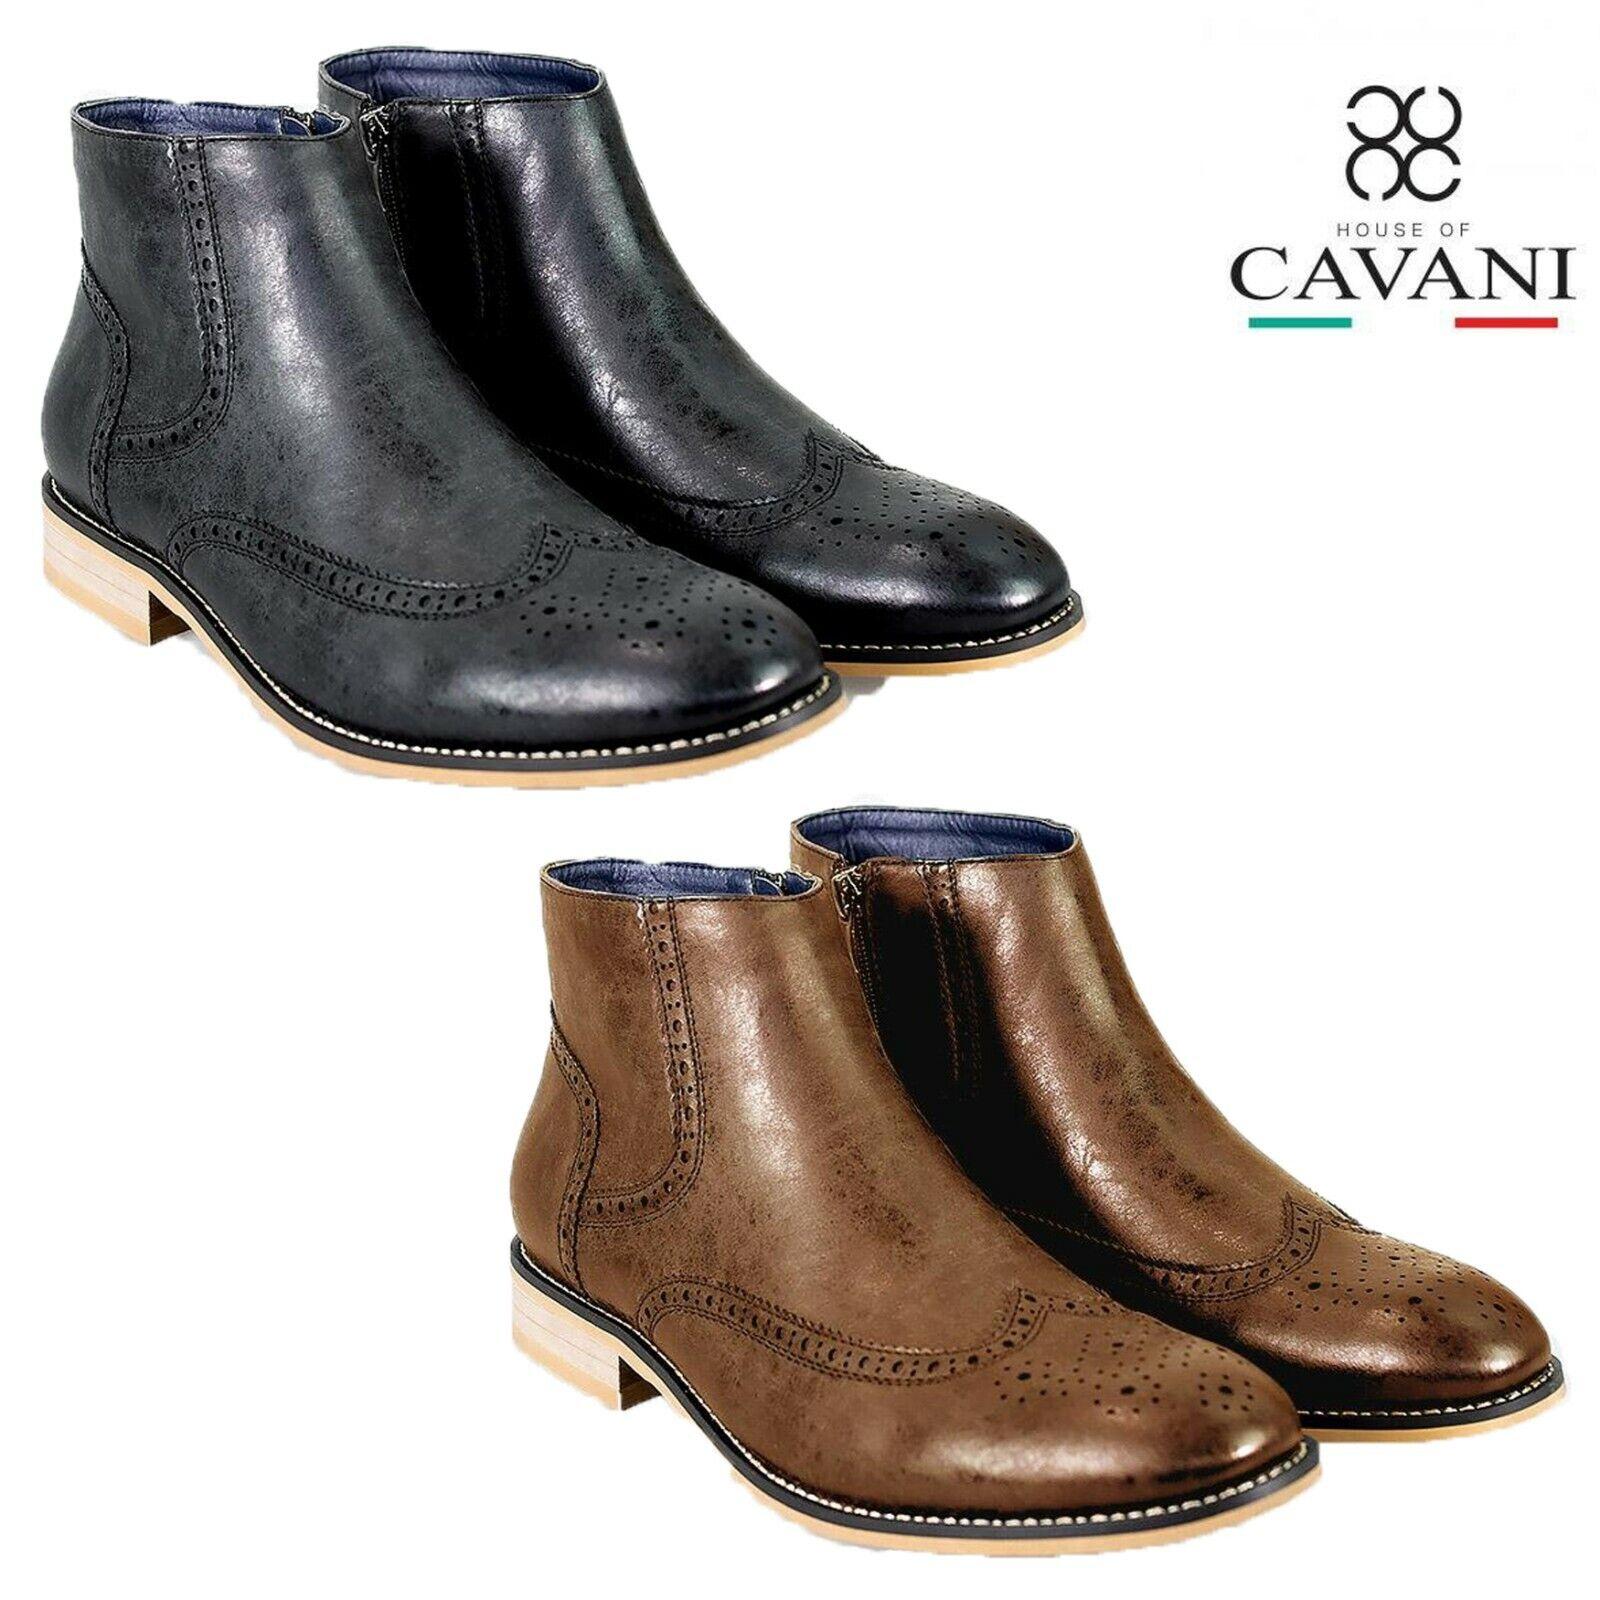 Mens Cavani Chelsea Stiefel Brogue Patterning schuhe Smart Casual Footwear Zip Up